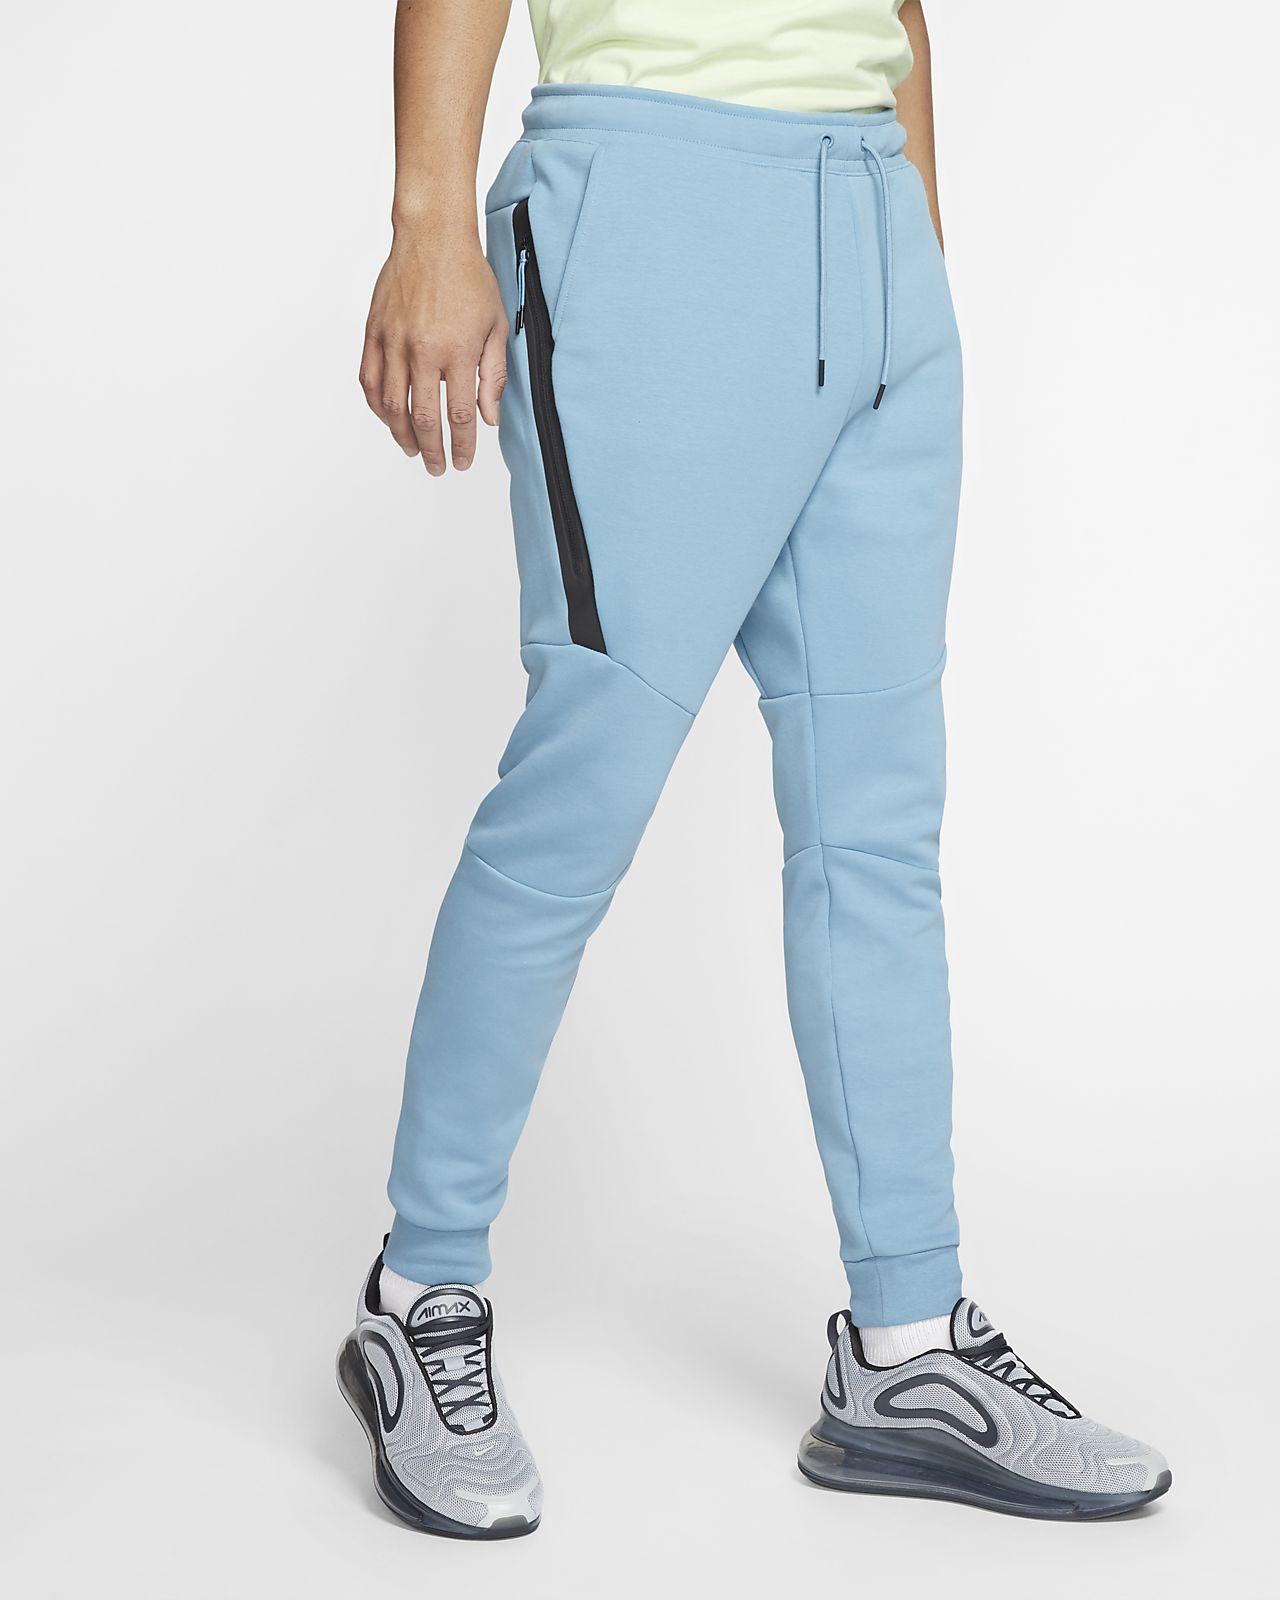 NIKE Sportswear joggebukse dame G Sport | G MAX